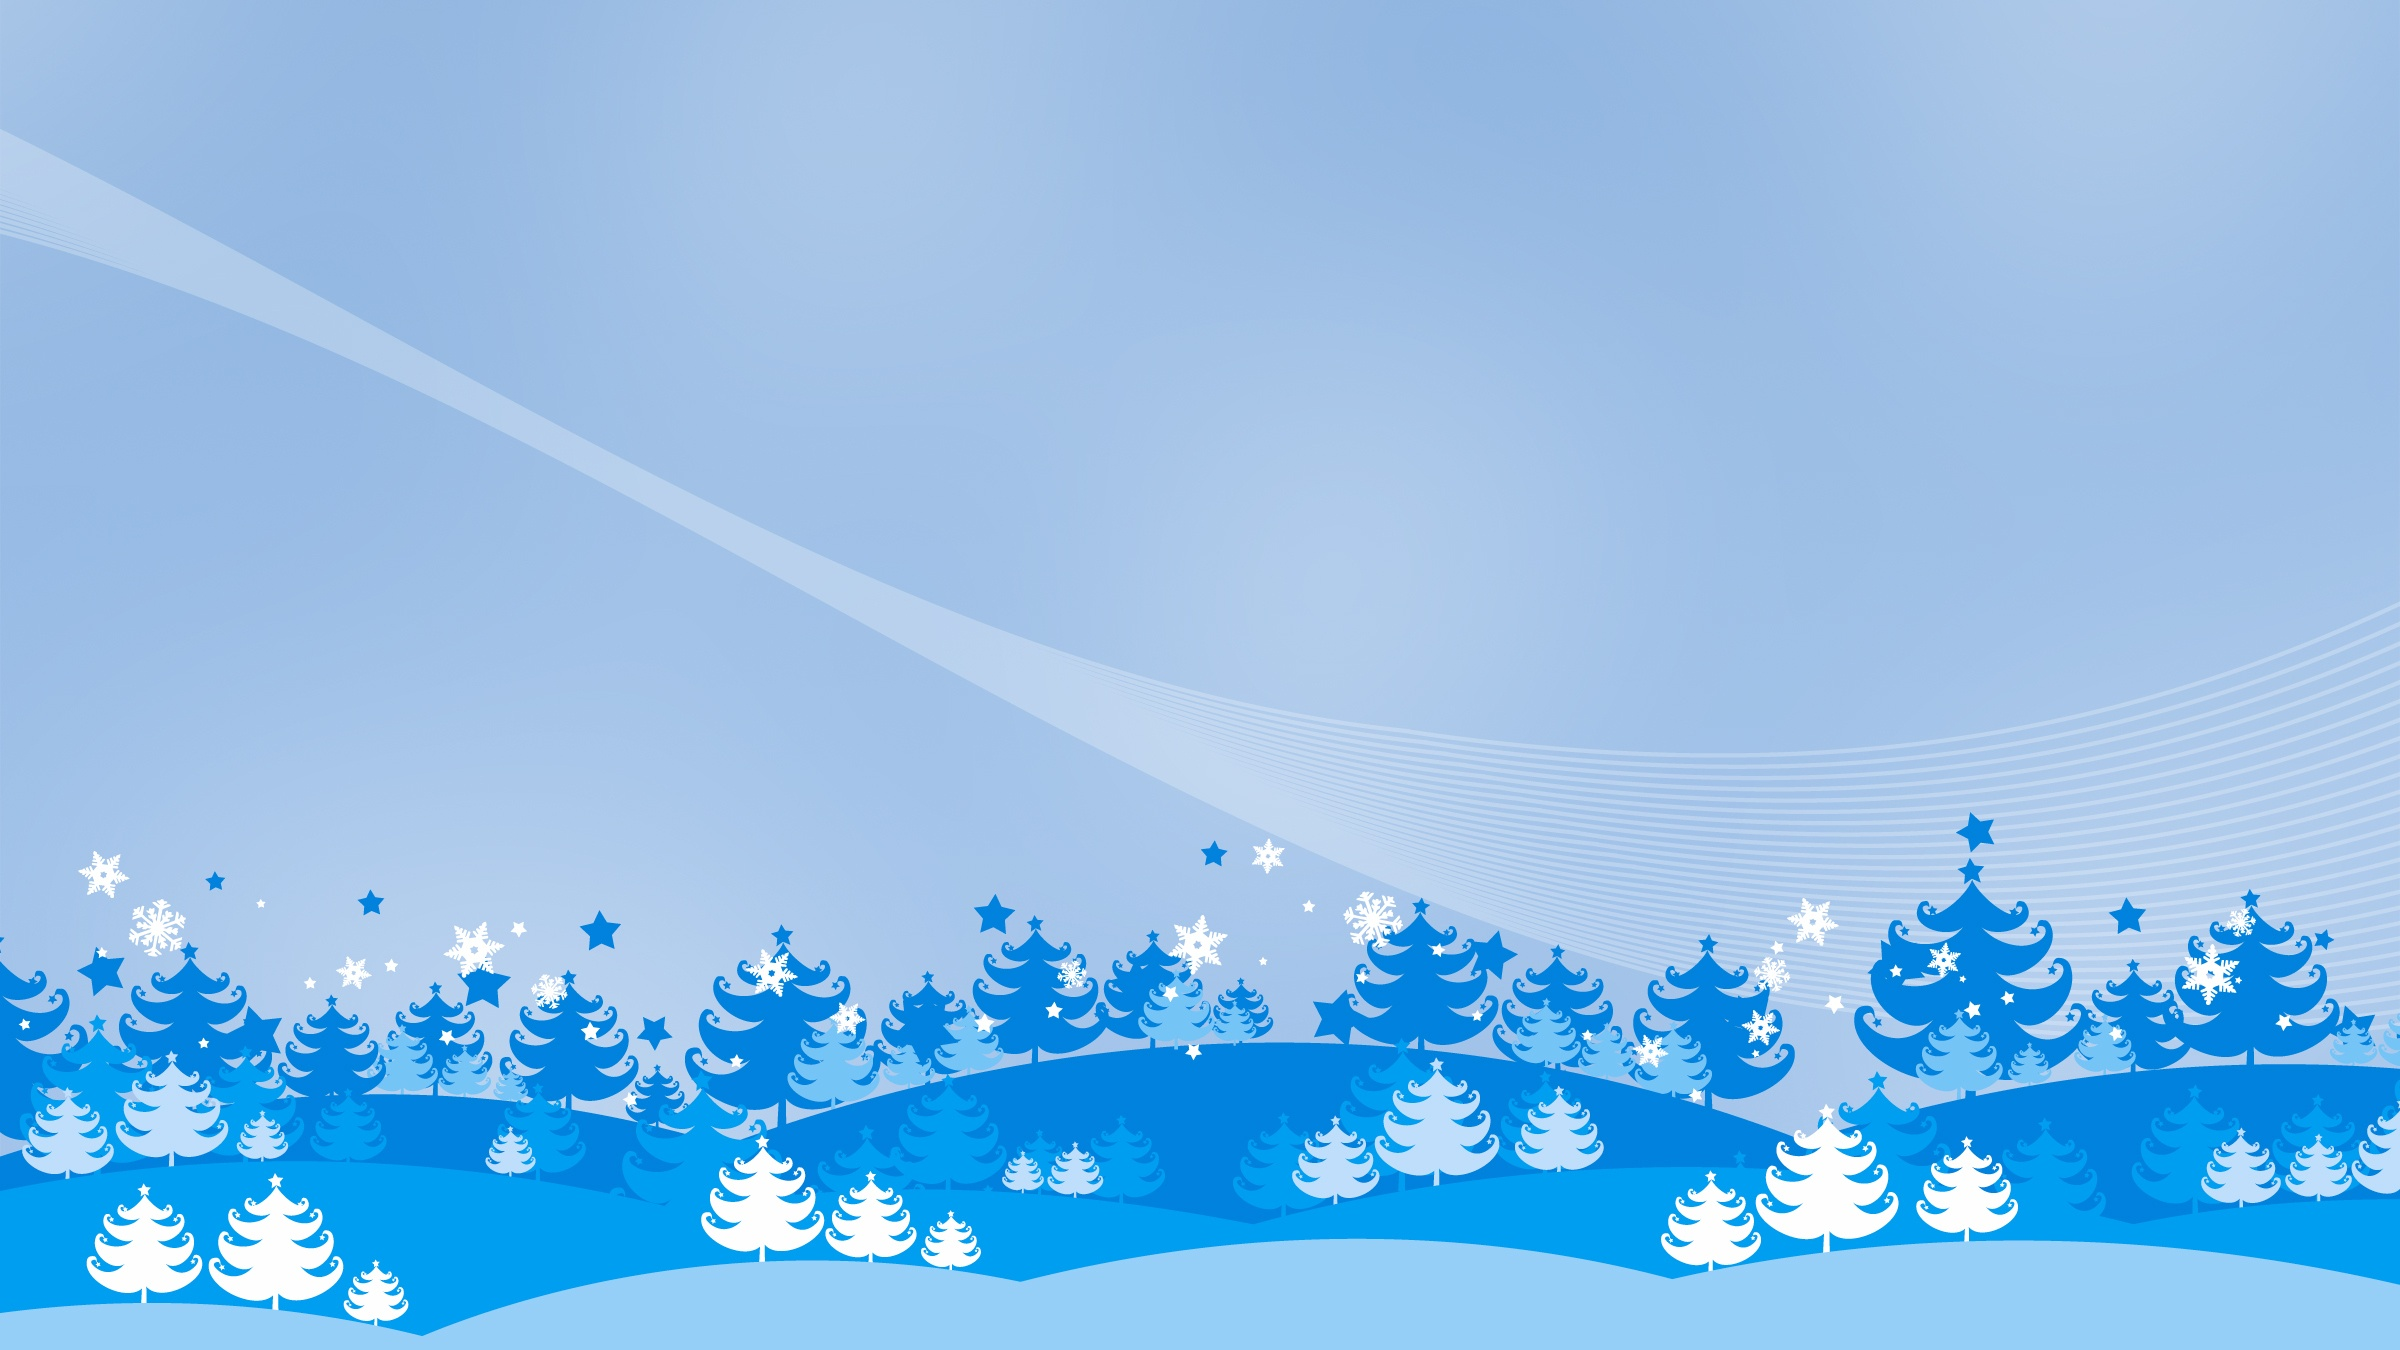 008 Free Holiday Card Templates Bsilvia Christmascard2008Bsilvia - Free Printable Xmas Cards Online